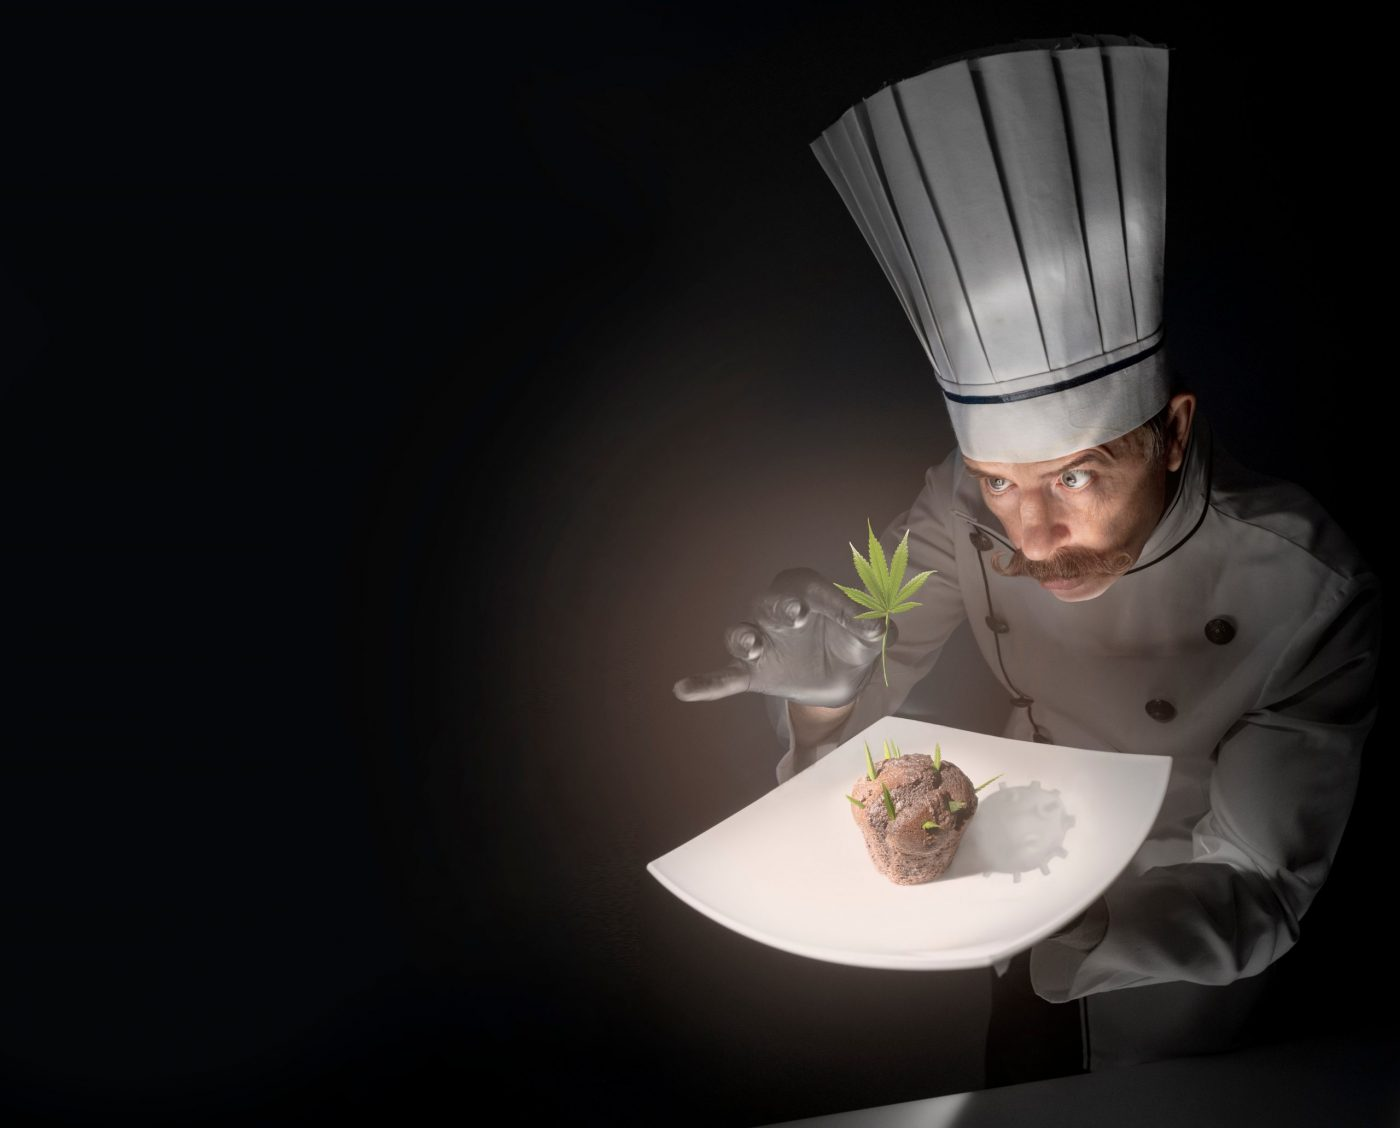 cannabis culinary chef